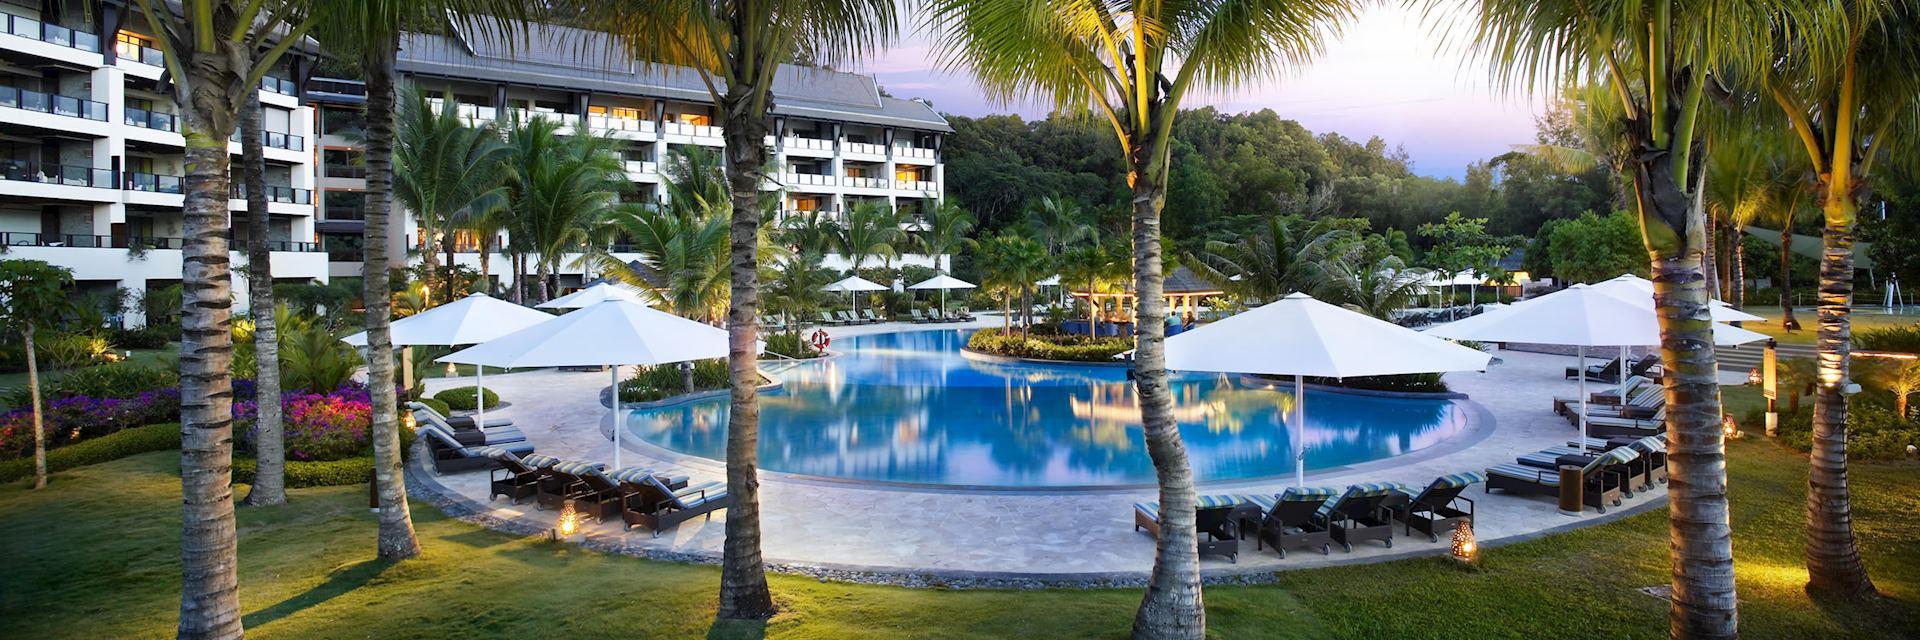 Shangri-La's Rasa Ria Resort